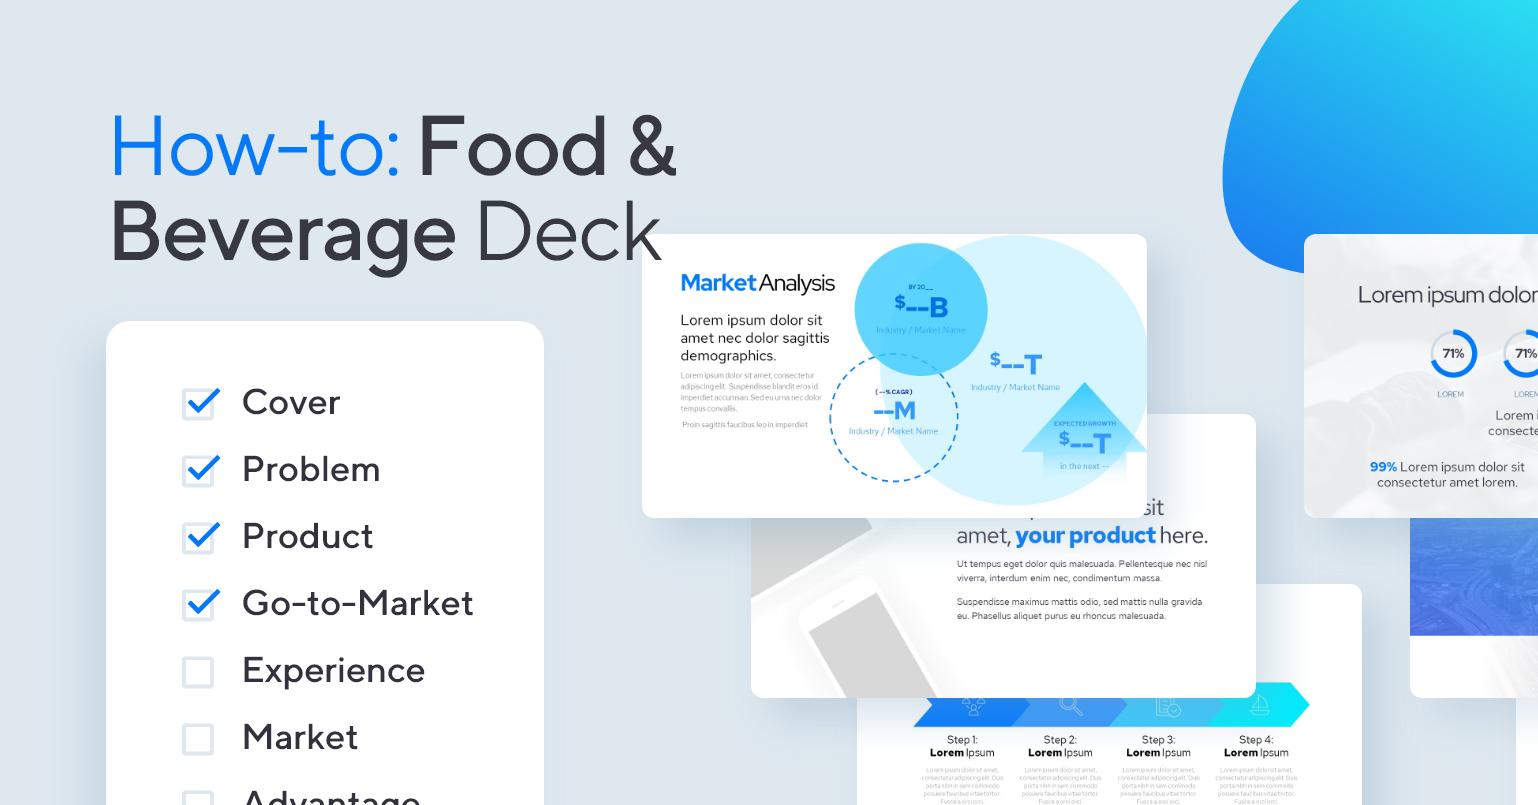 How-to design a Food & Beverage deck